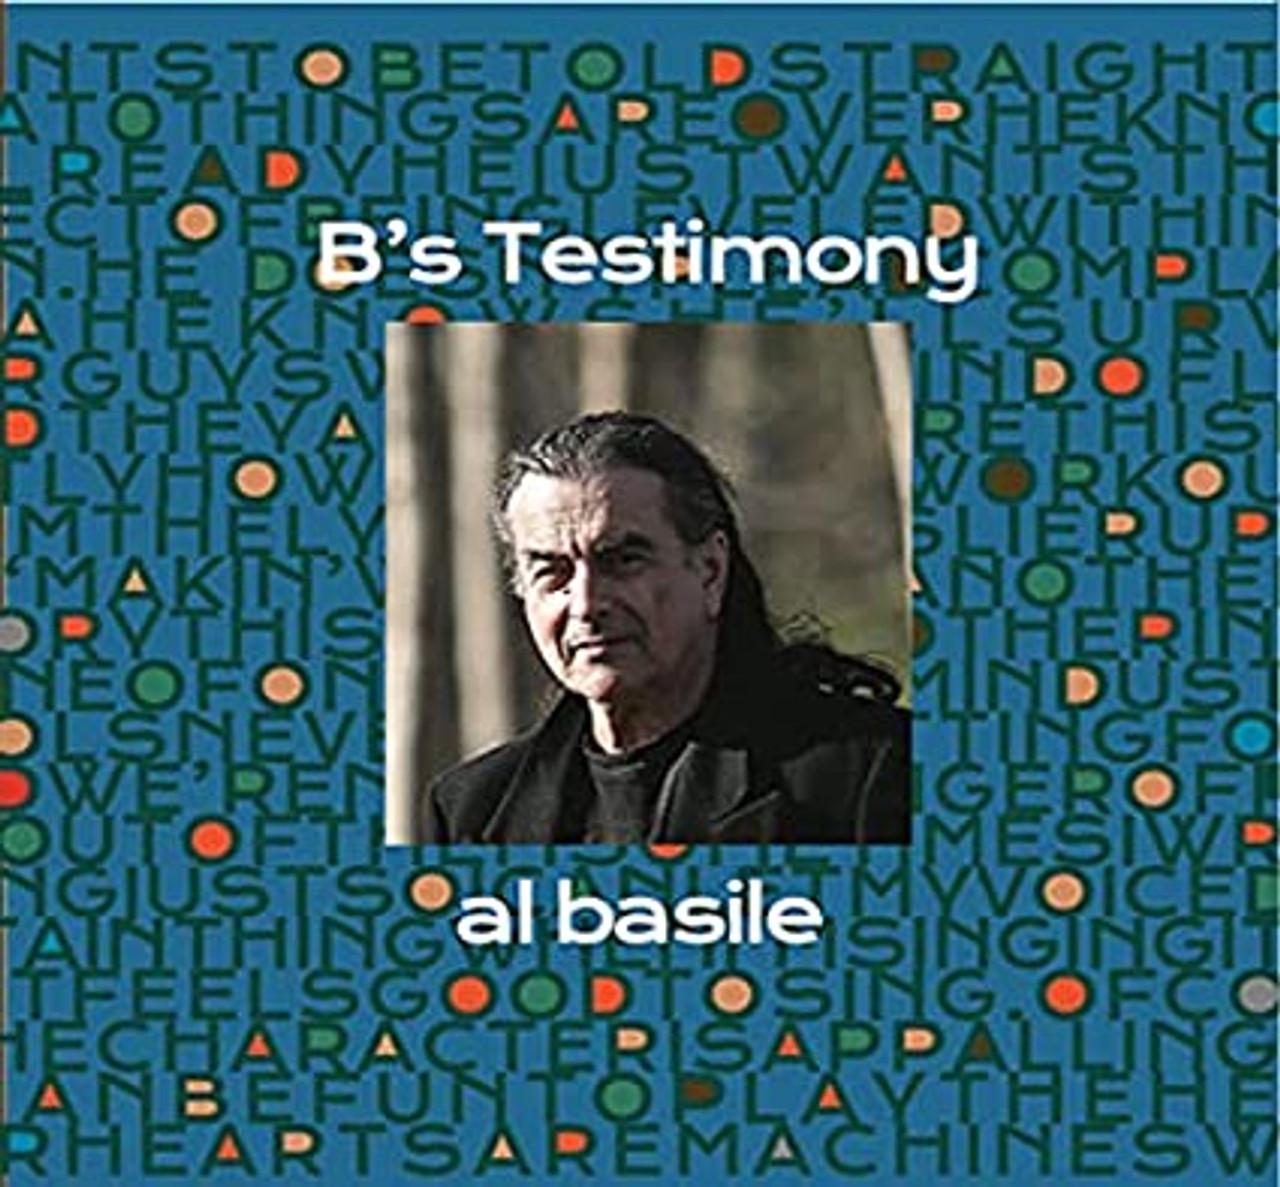 AL BASILE -B'S TESTIMONY